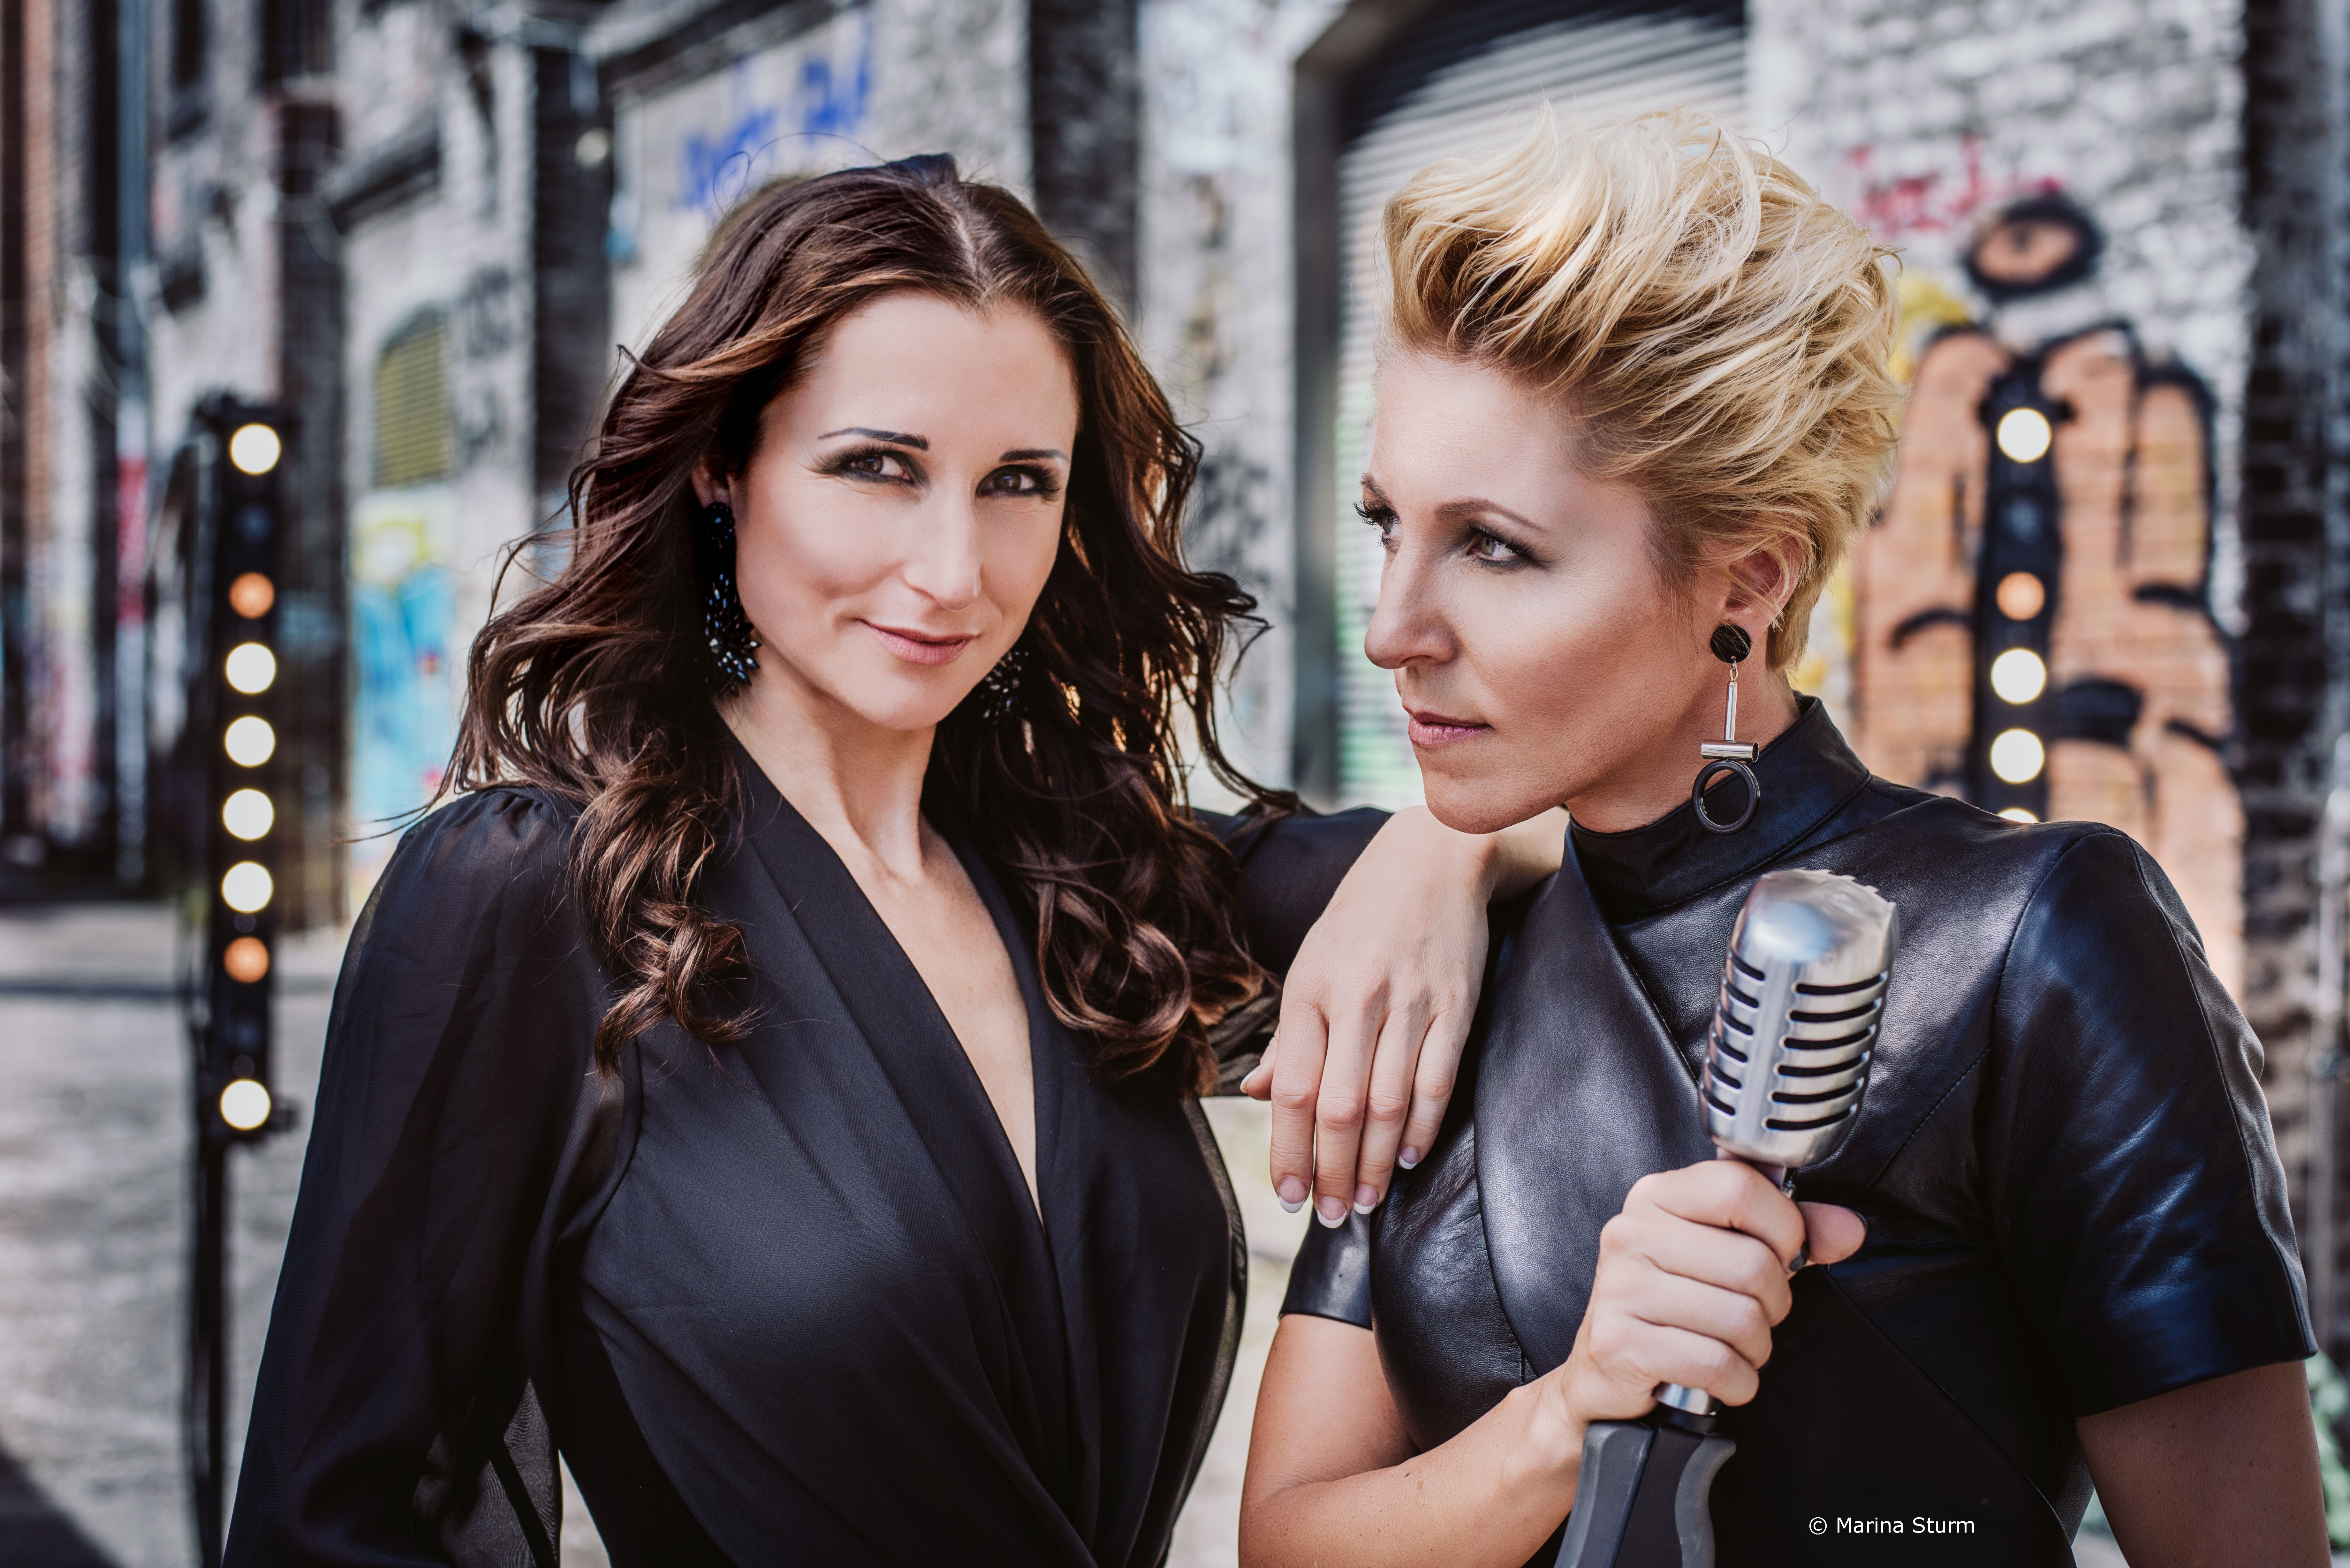 Ww-Terminator: 30 Jahre Leidenschaft - Antia & Alexandra Hofmann - Stadthalle Beverungen - Beverungen